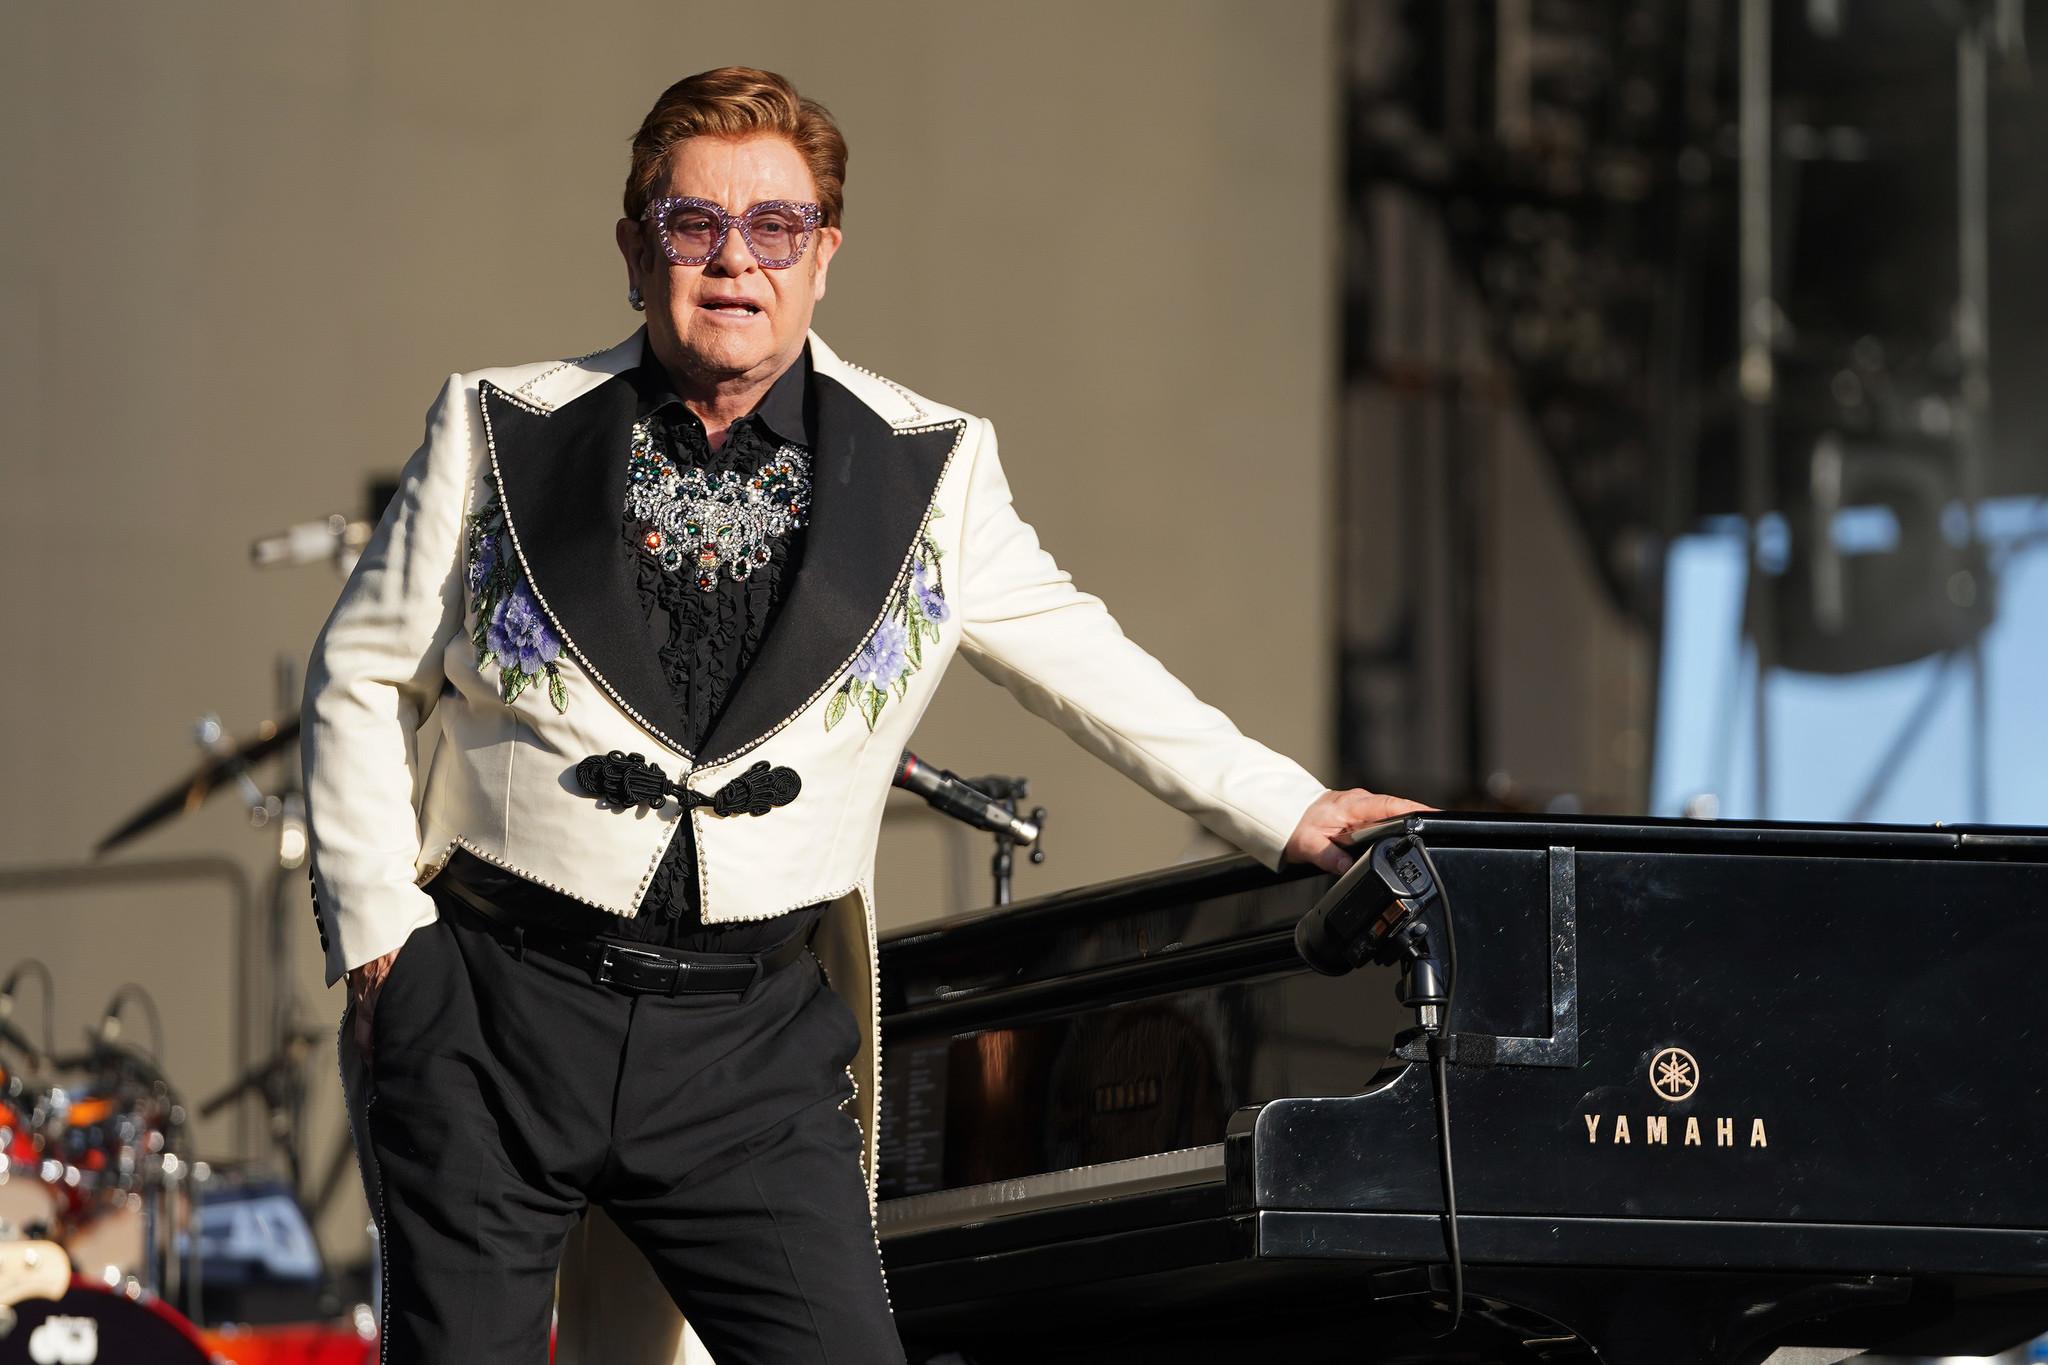 Elton John announces he has walking pneumonia after ending New Zealand concert early